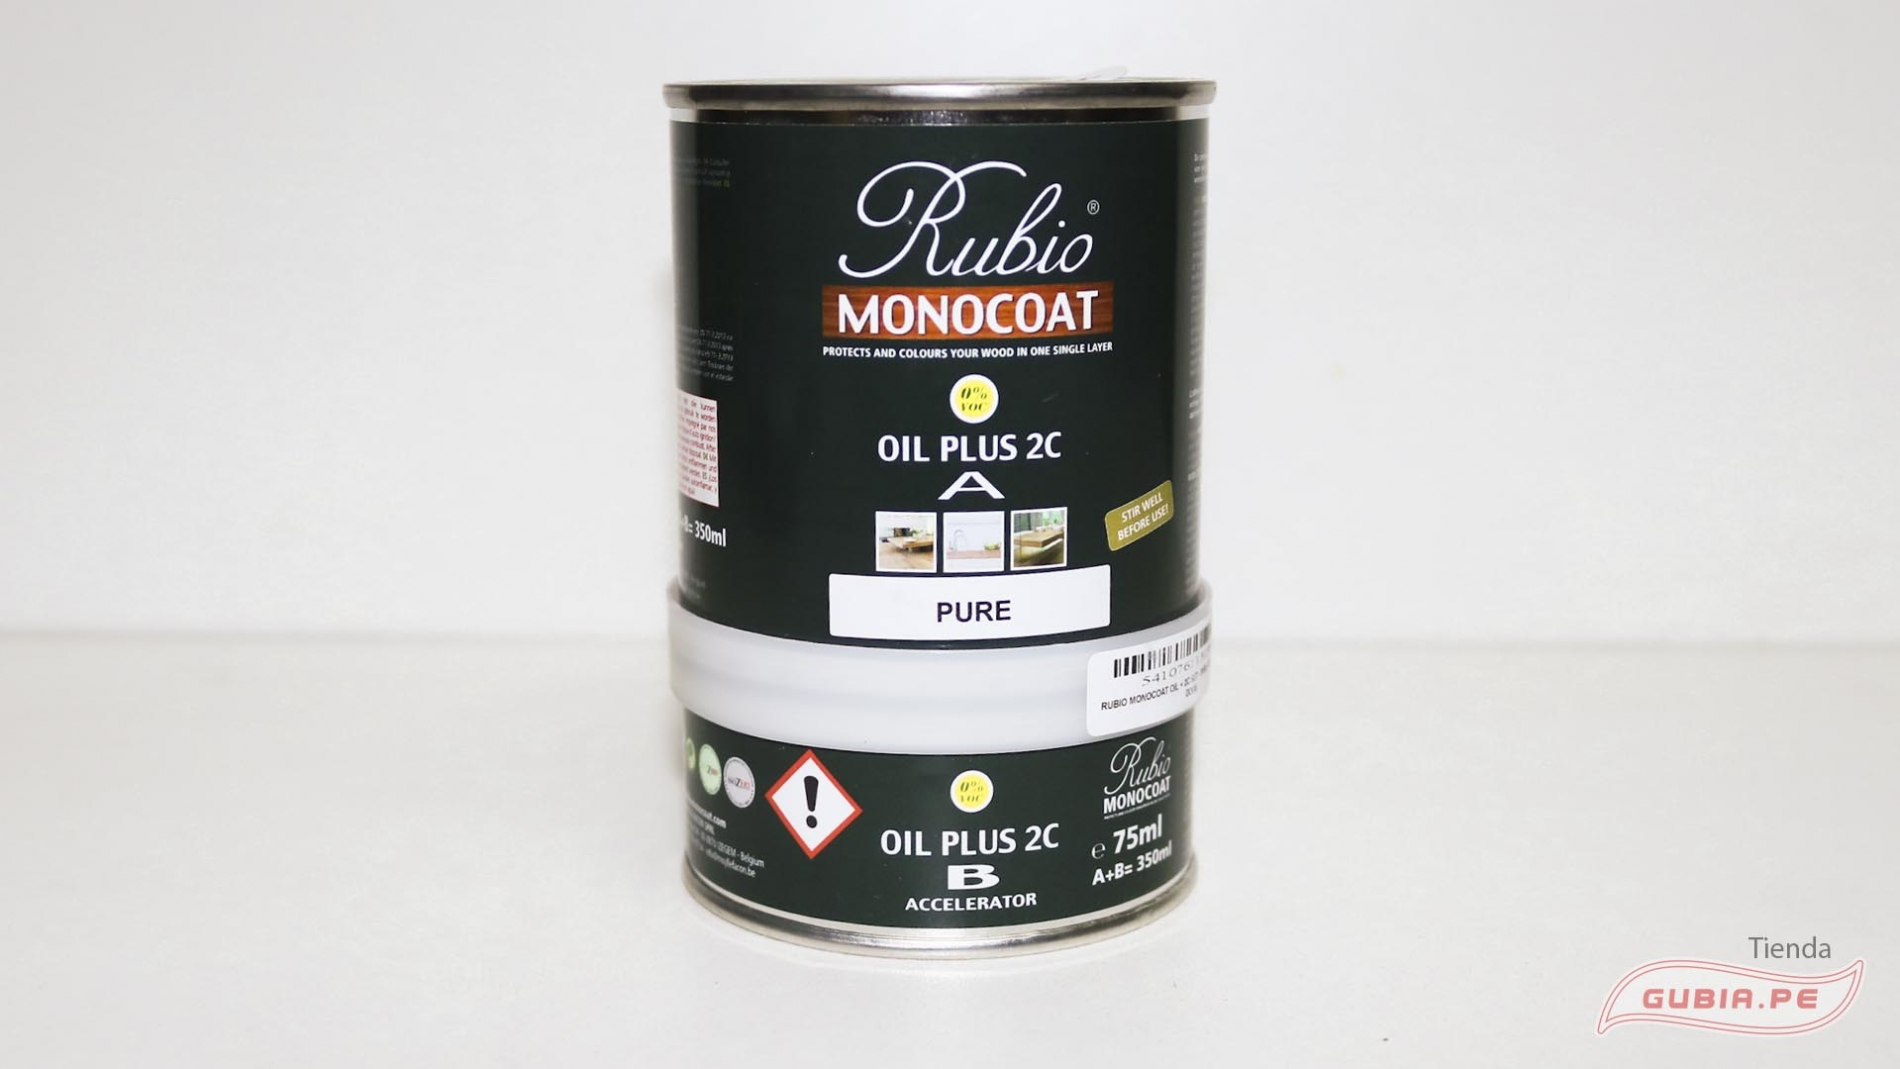 5410761131564-Pure SET A+B Oil Plus 2C (350ml) RMC-max-1.